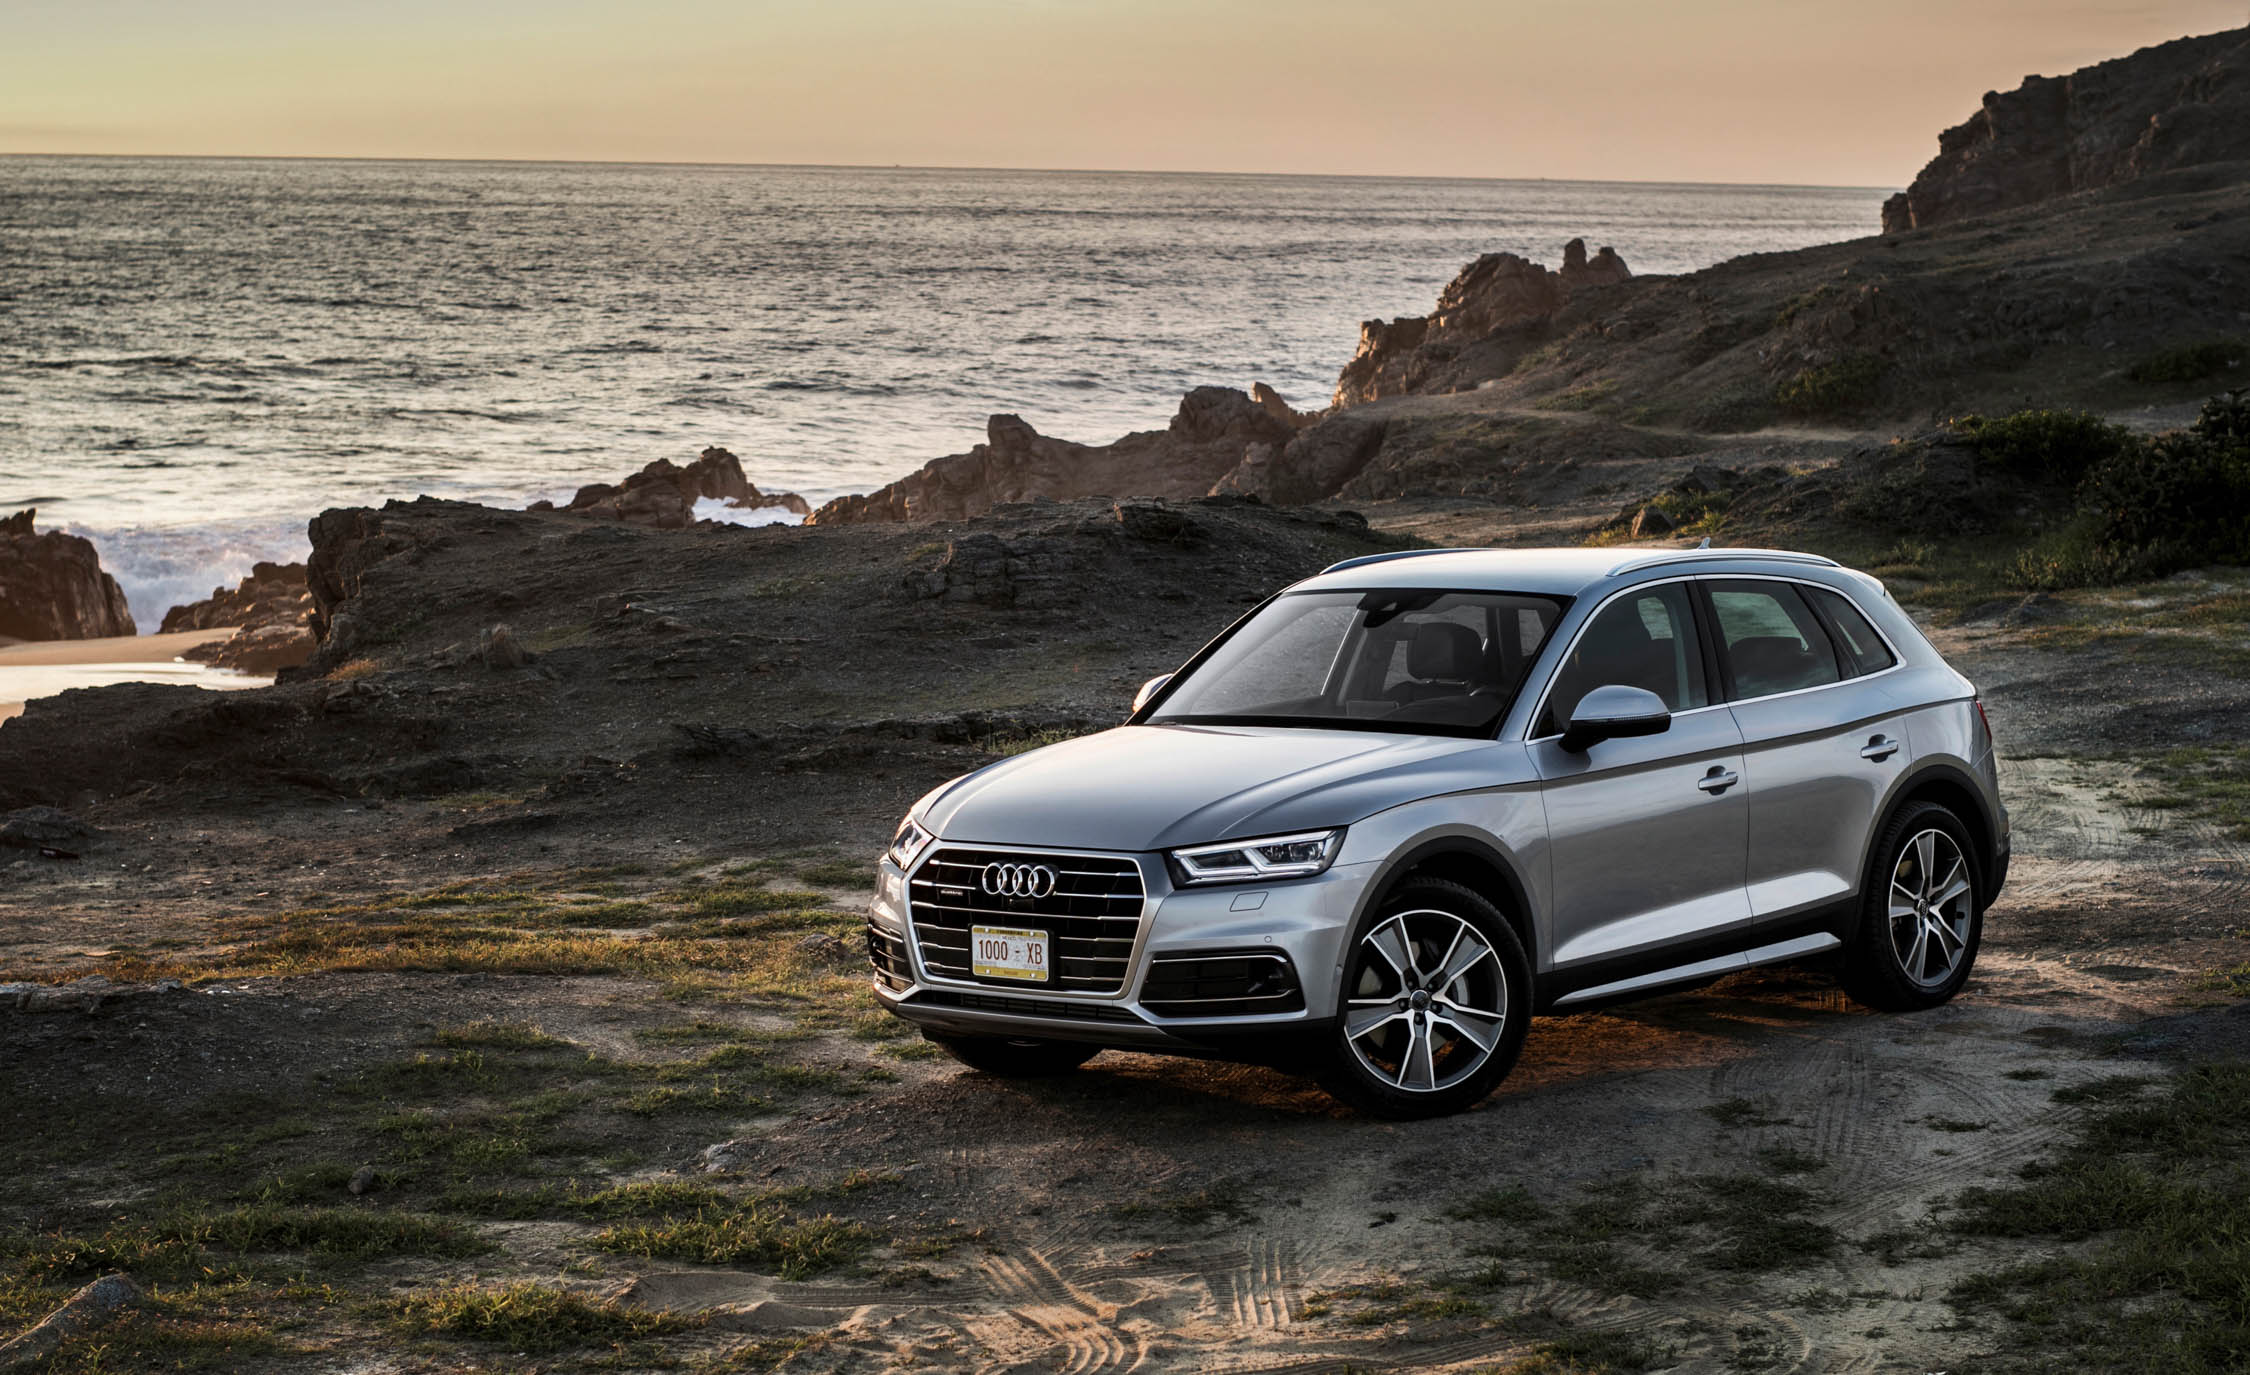 2018 Audi Q (View 6 of 40)